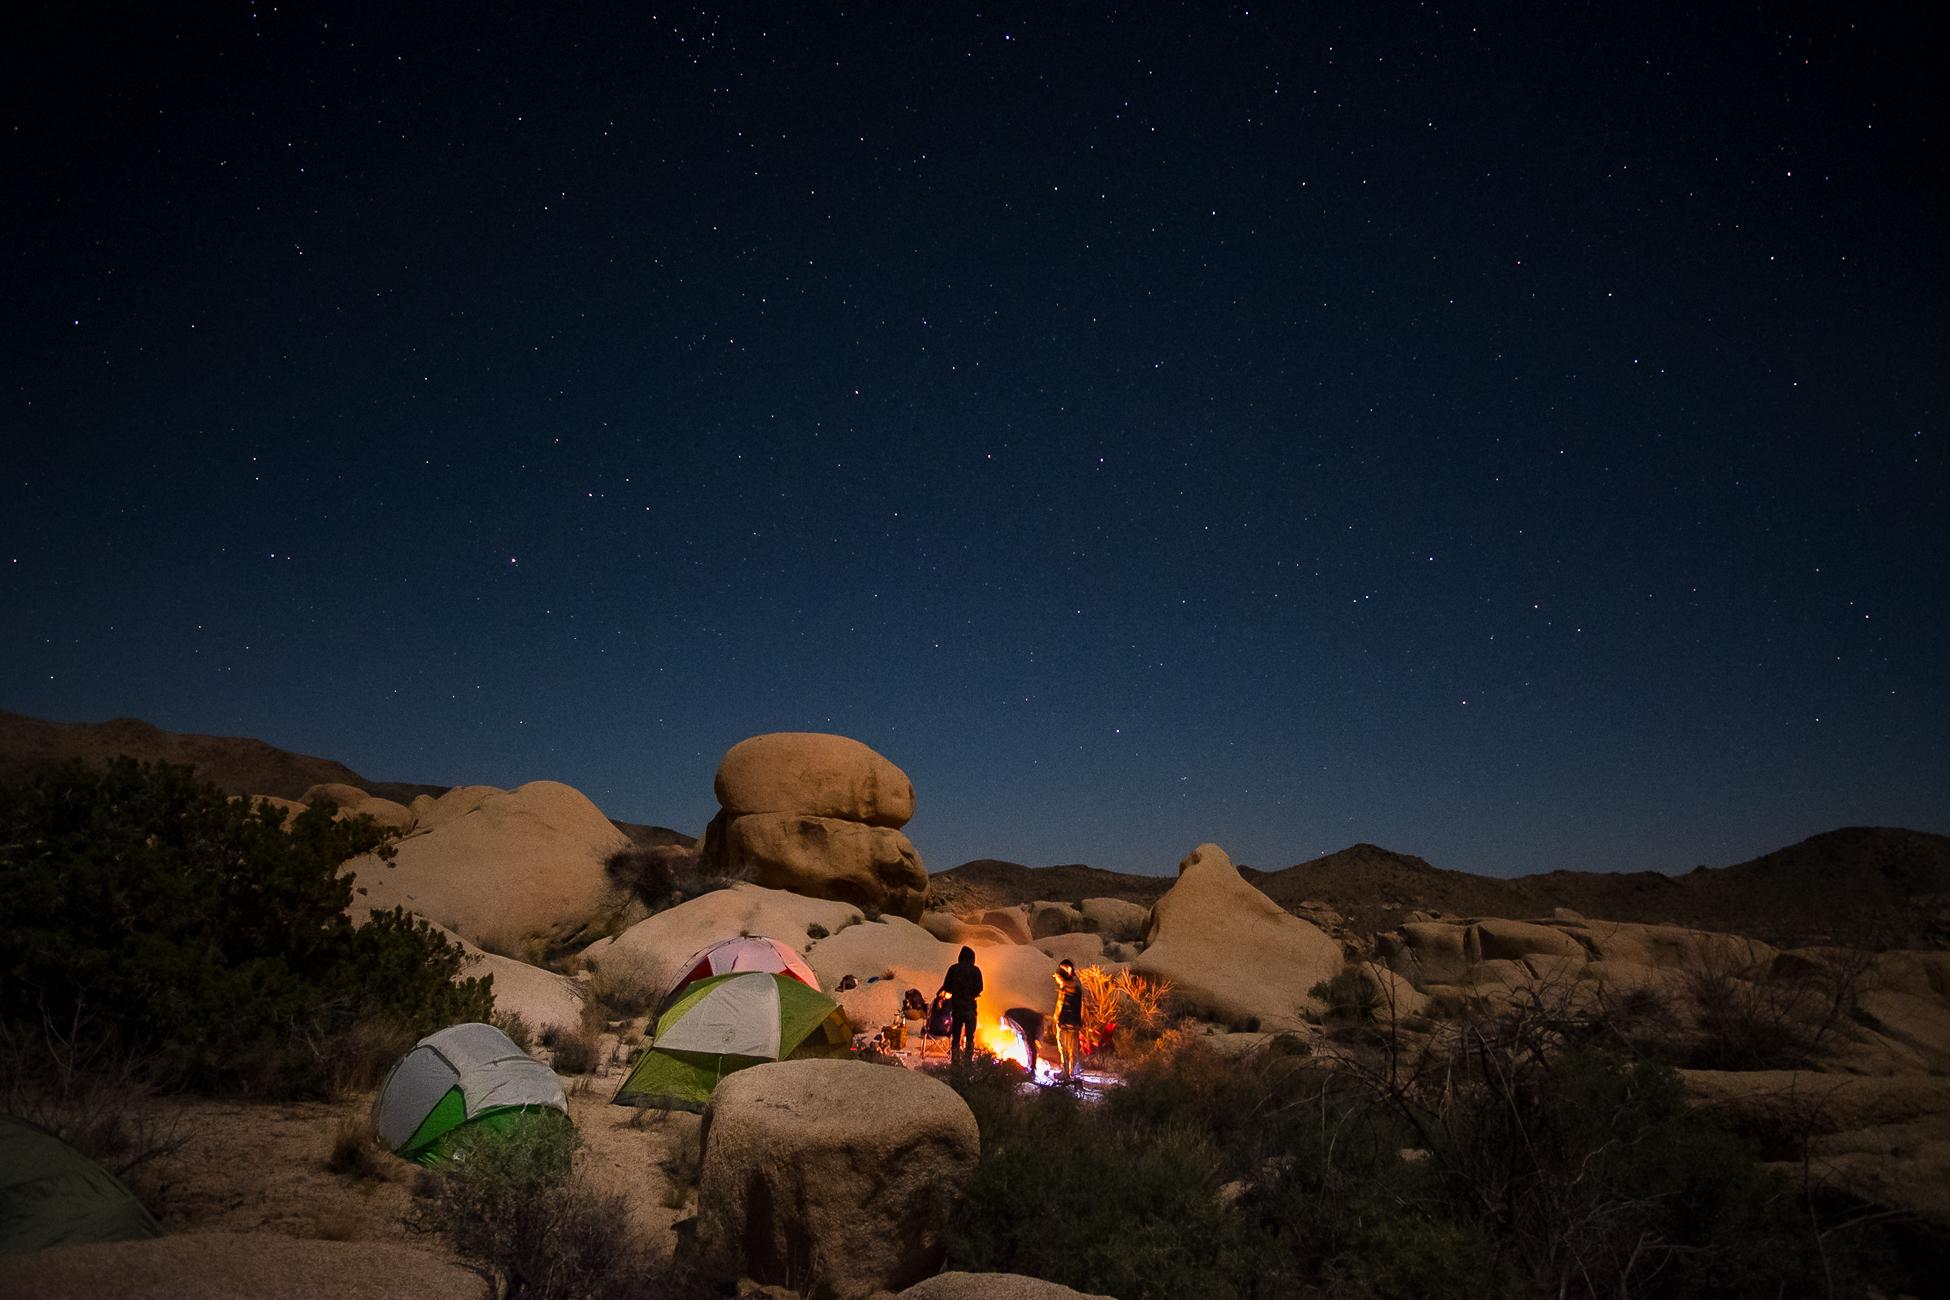 camping-joshuatree9871-2-2.jpg